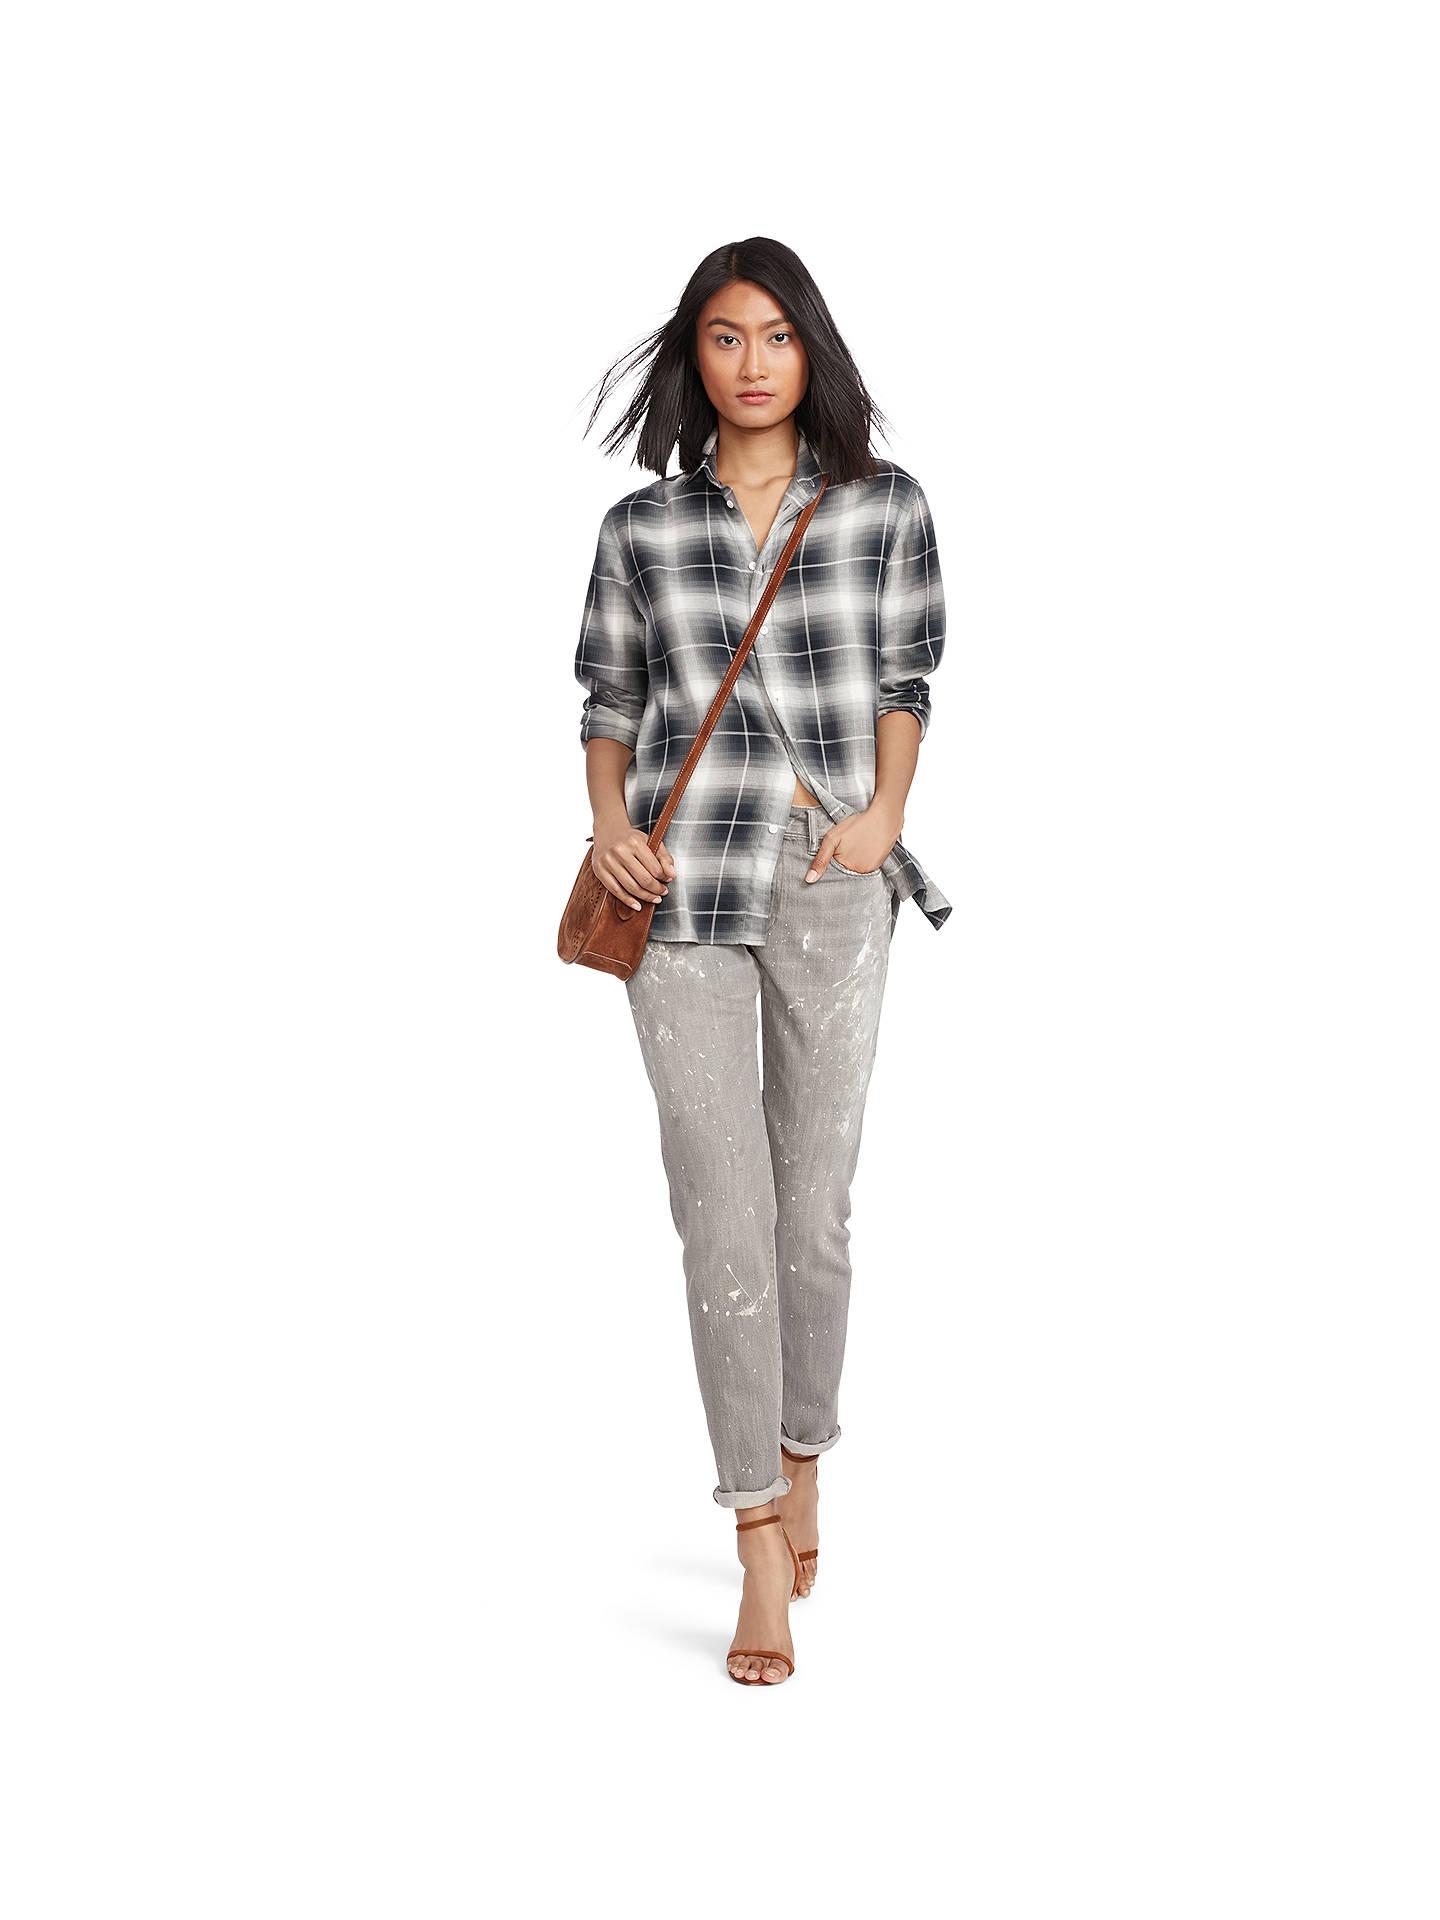 038666c9b07a ... BuyPolo Ralph Lauren Astor Slim Boyfriend Jeans, Grey, 26 Online at  johnlewis.com ...